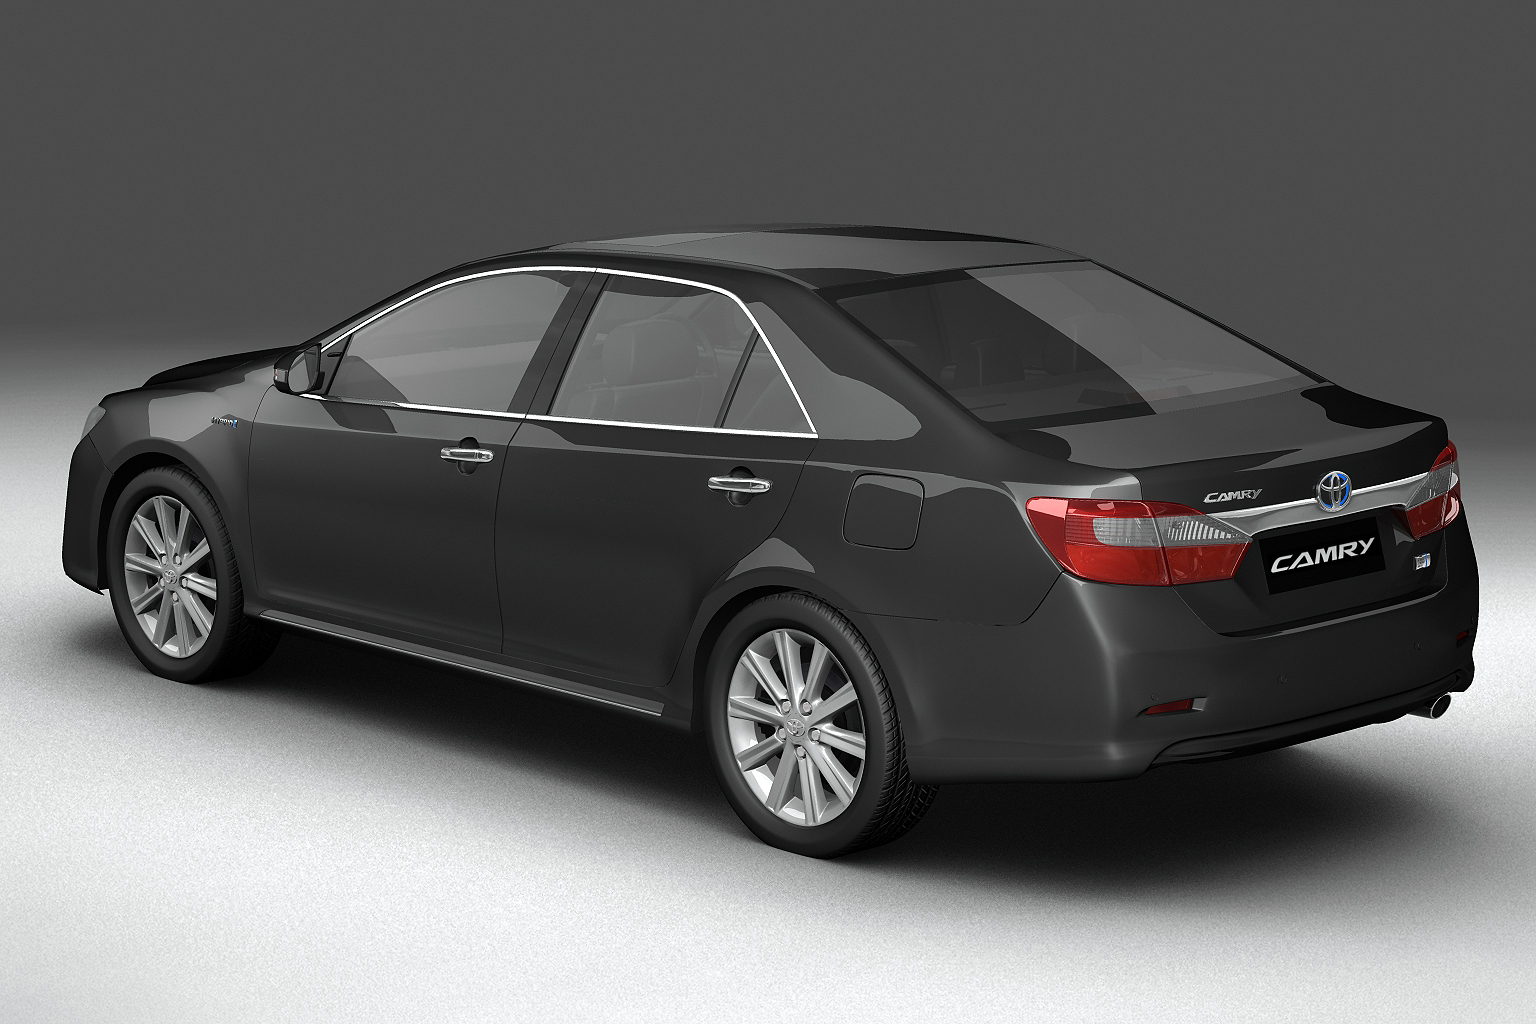 2012 toyota camry model 3d hybrid (asian) 3ds max fbx c4d lwo hrc xsi obj 136184